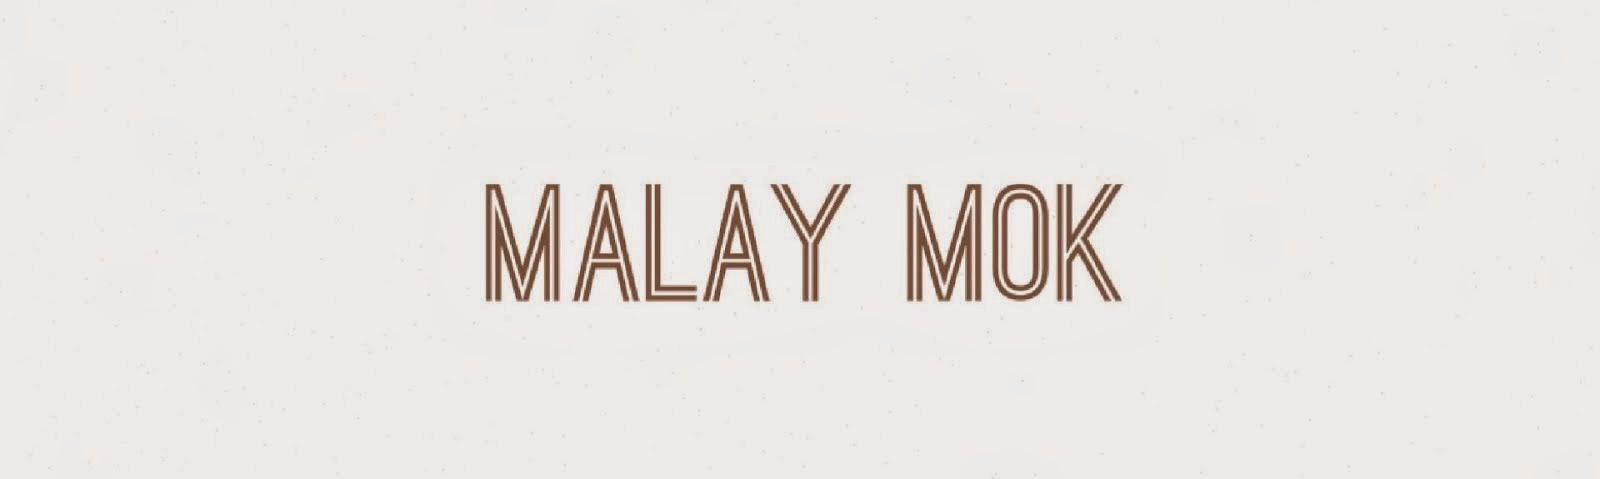 Malay Mok